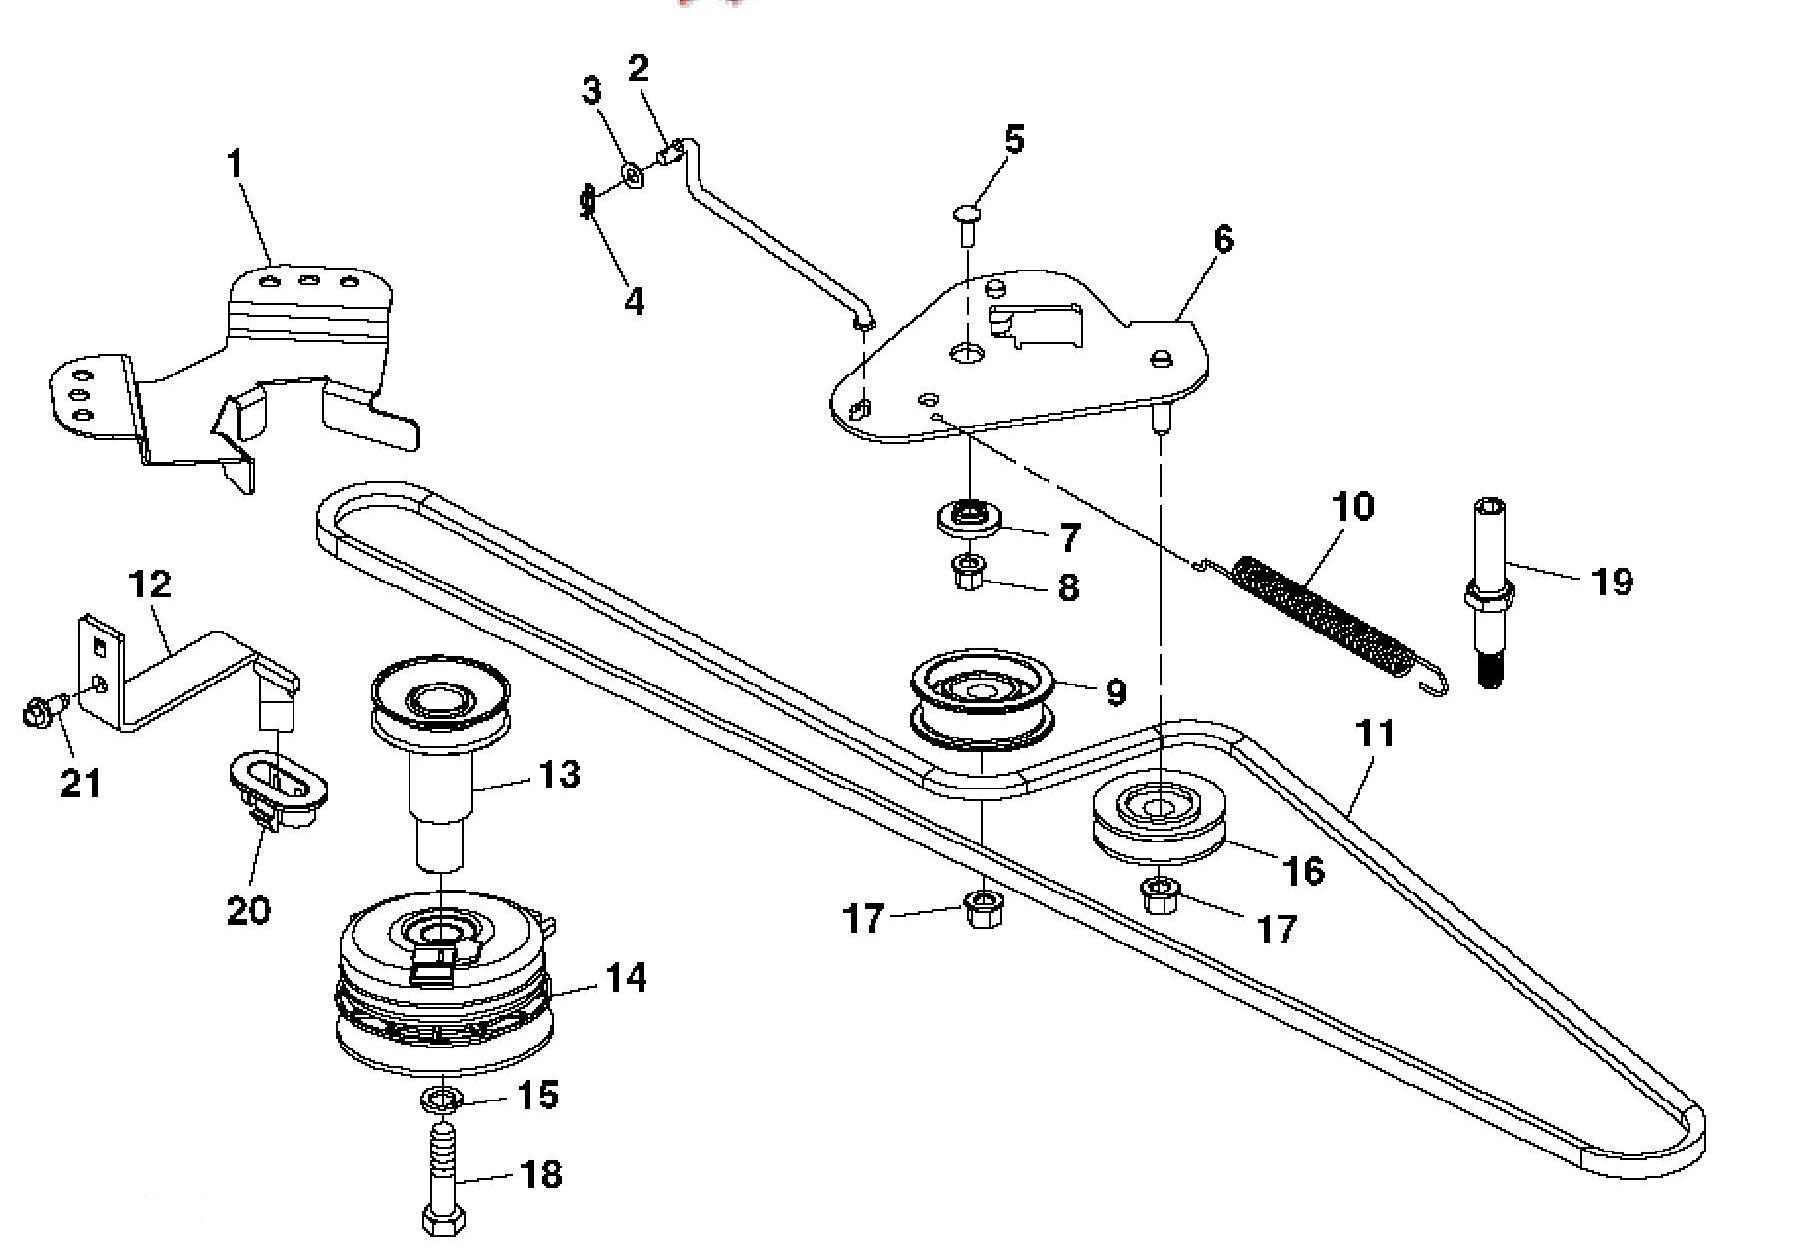 John Deere D110 Parts Manual